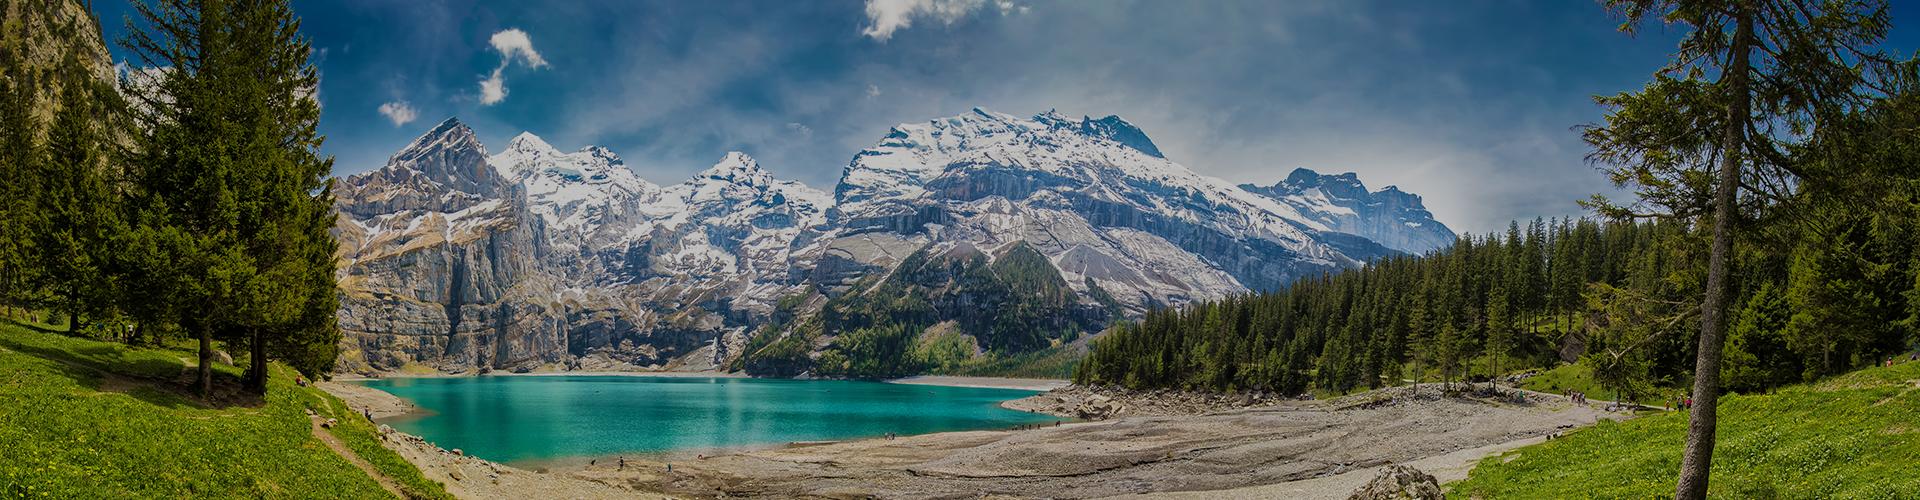 Landmark photograph of Switzerland